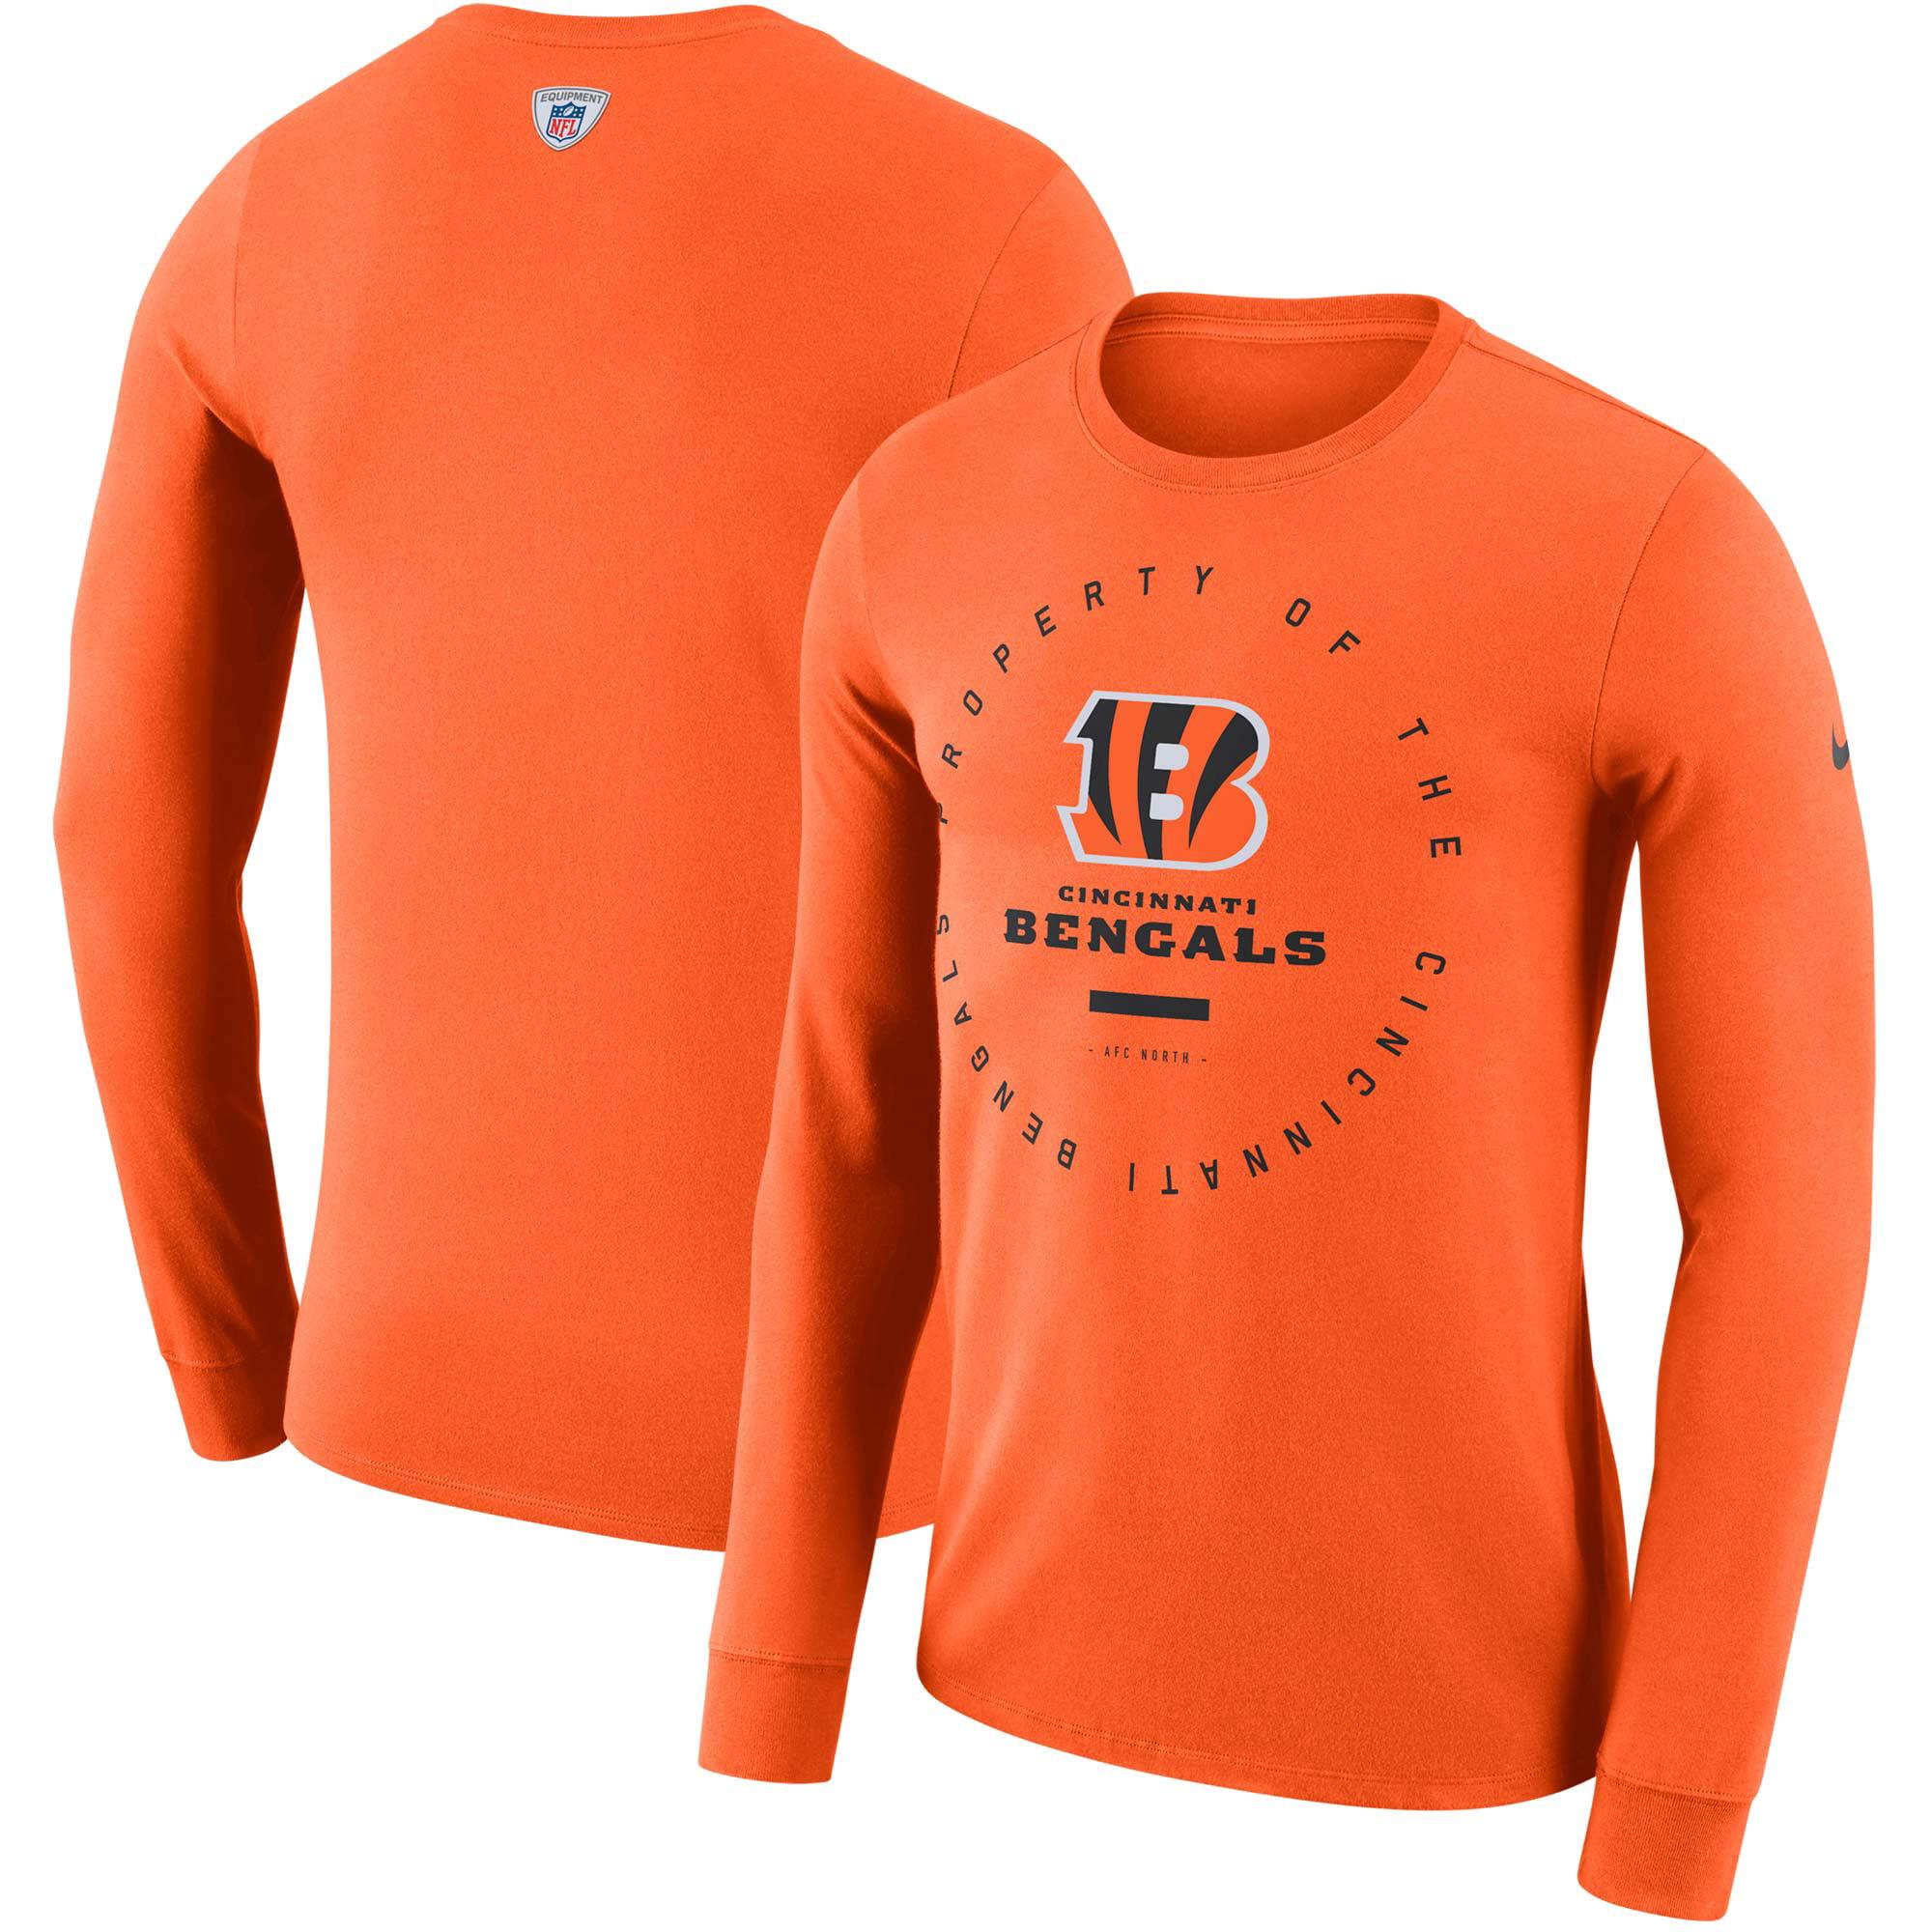 Cincinnati Bengals Nike Sideline Property Of Performance Long Sleeve T-Shirt - Orange